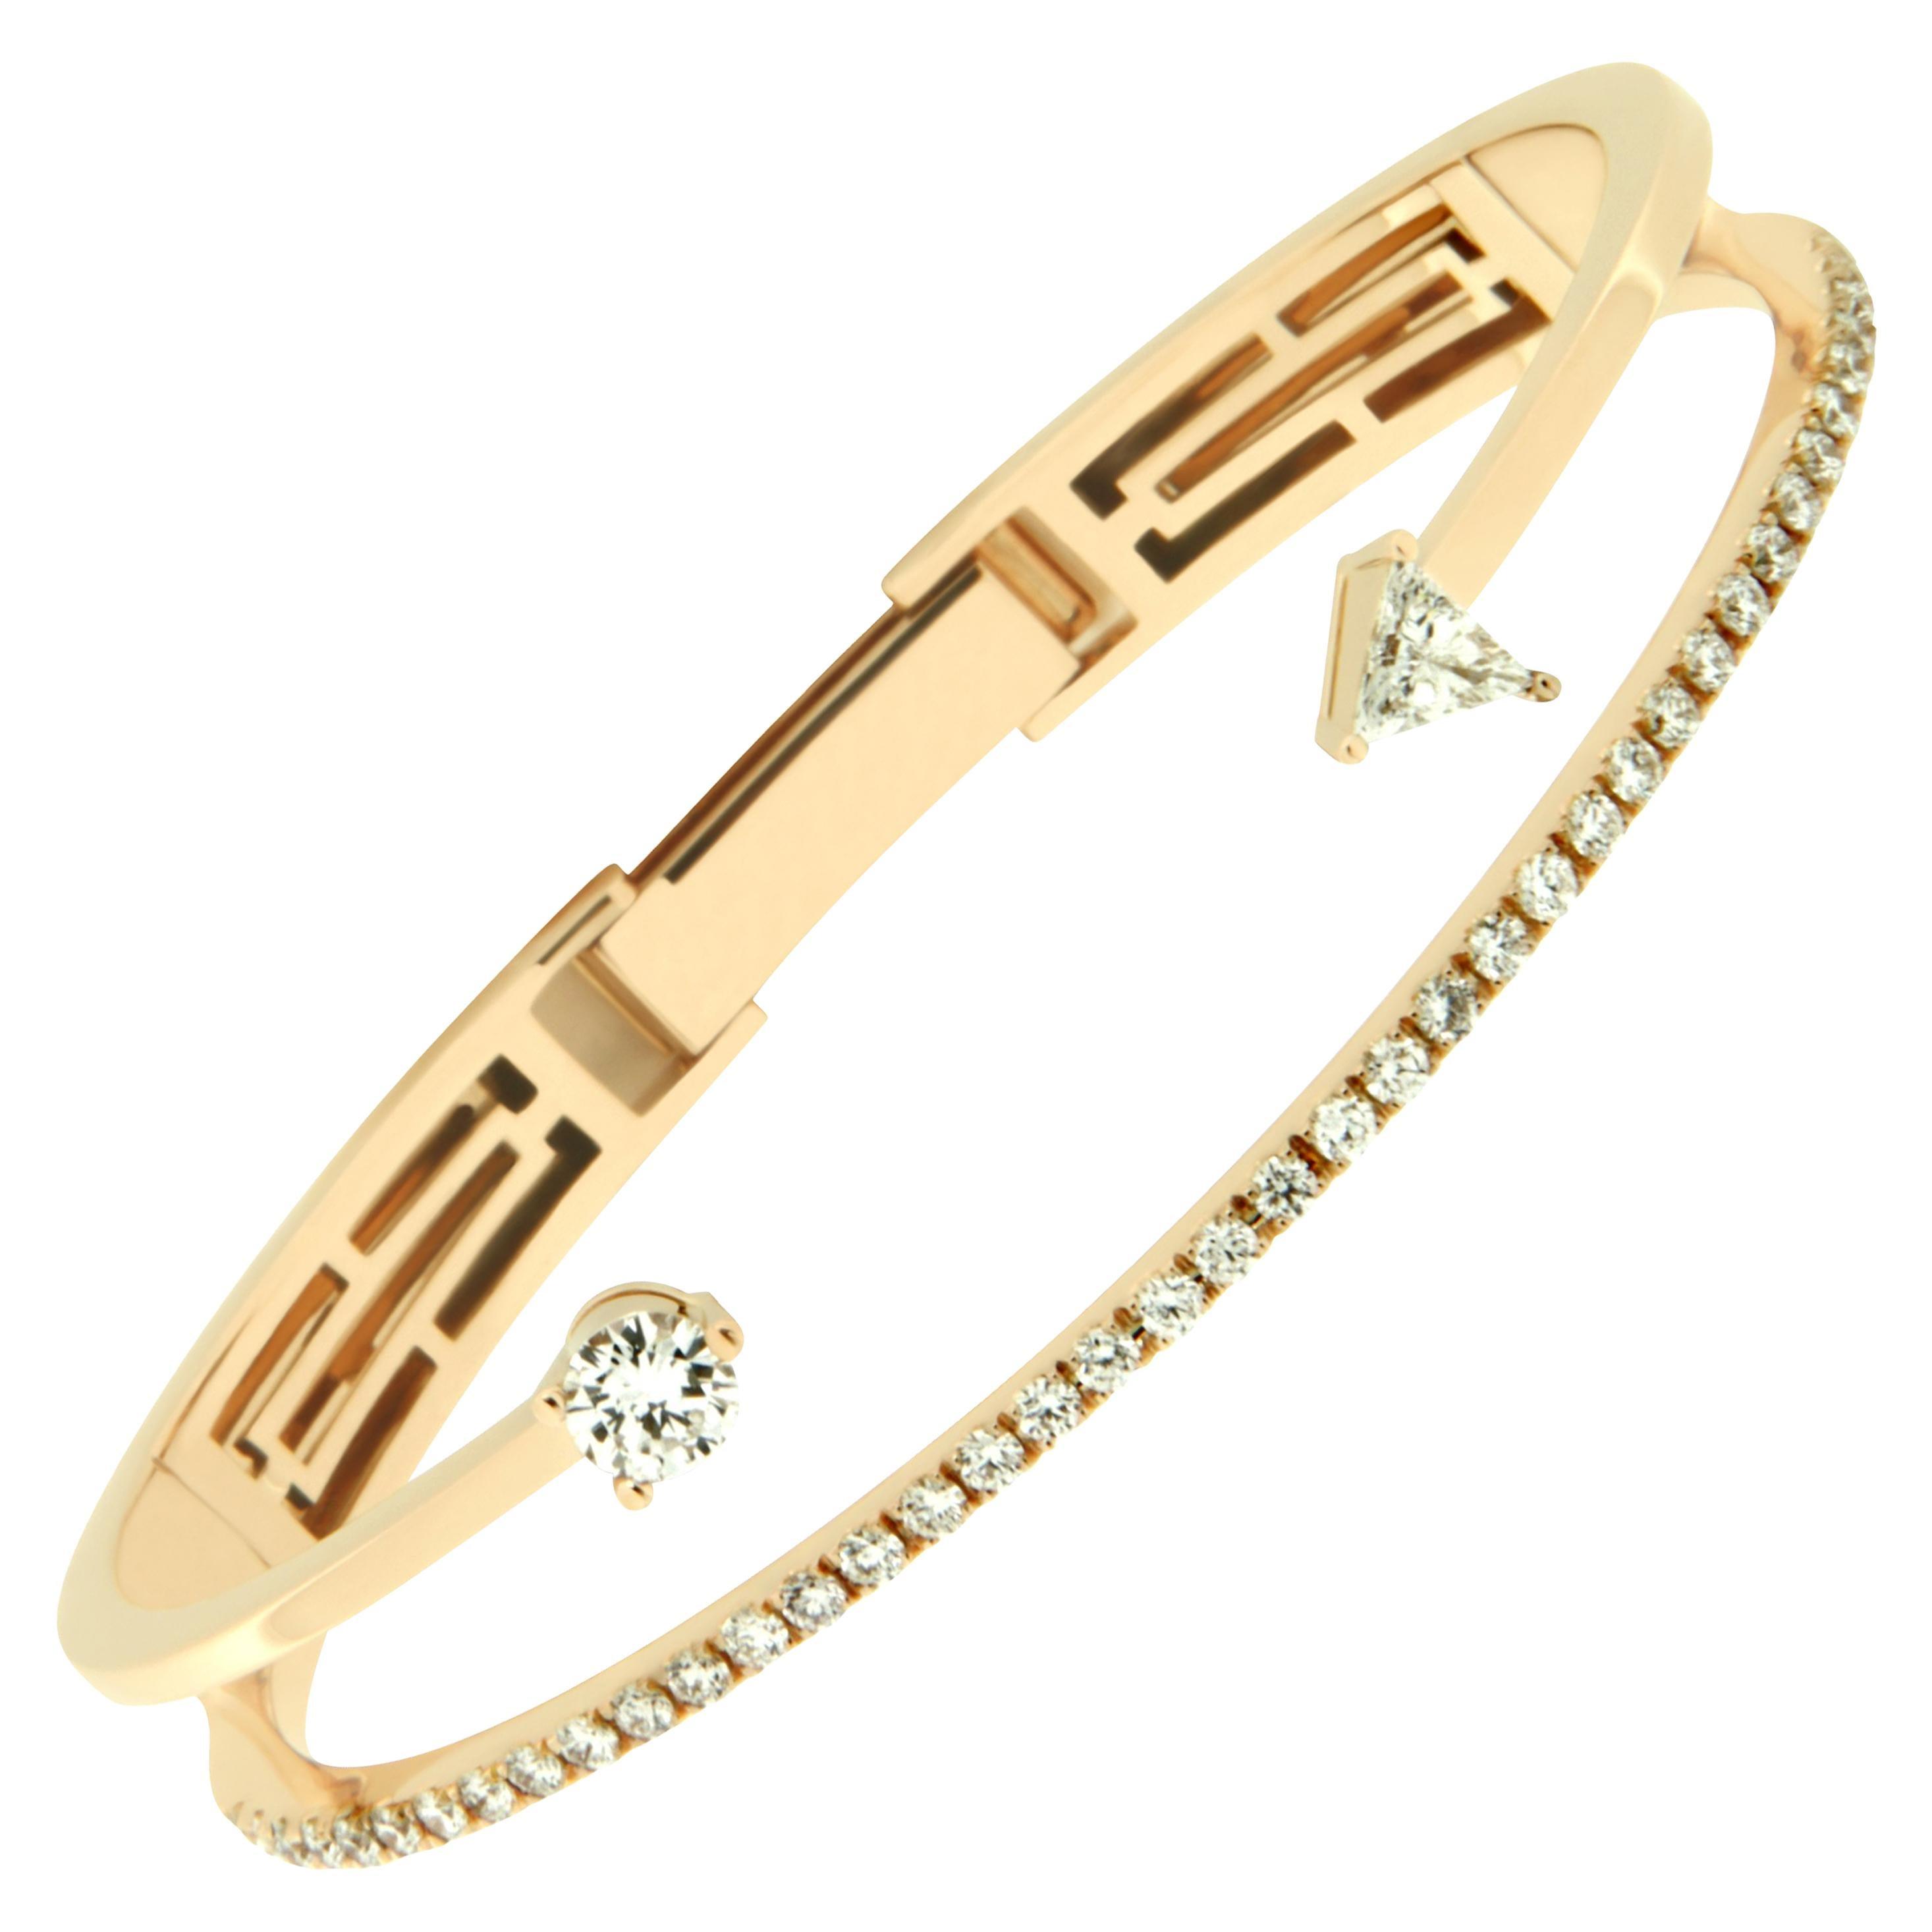 22c21fc0e731 DELFINA DELETTREZ Diamond Silver Gold Plated Finger Cuff Bracelet For Sale  at 1stdibs